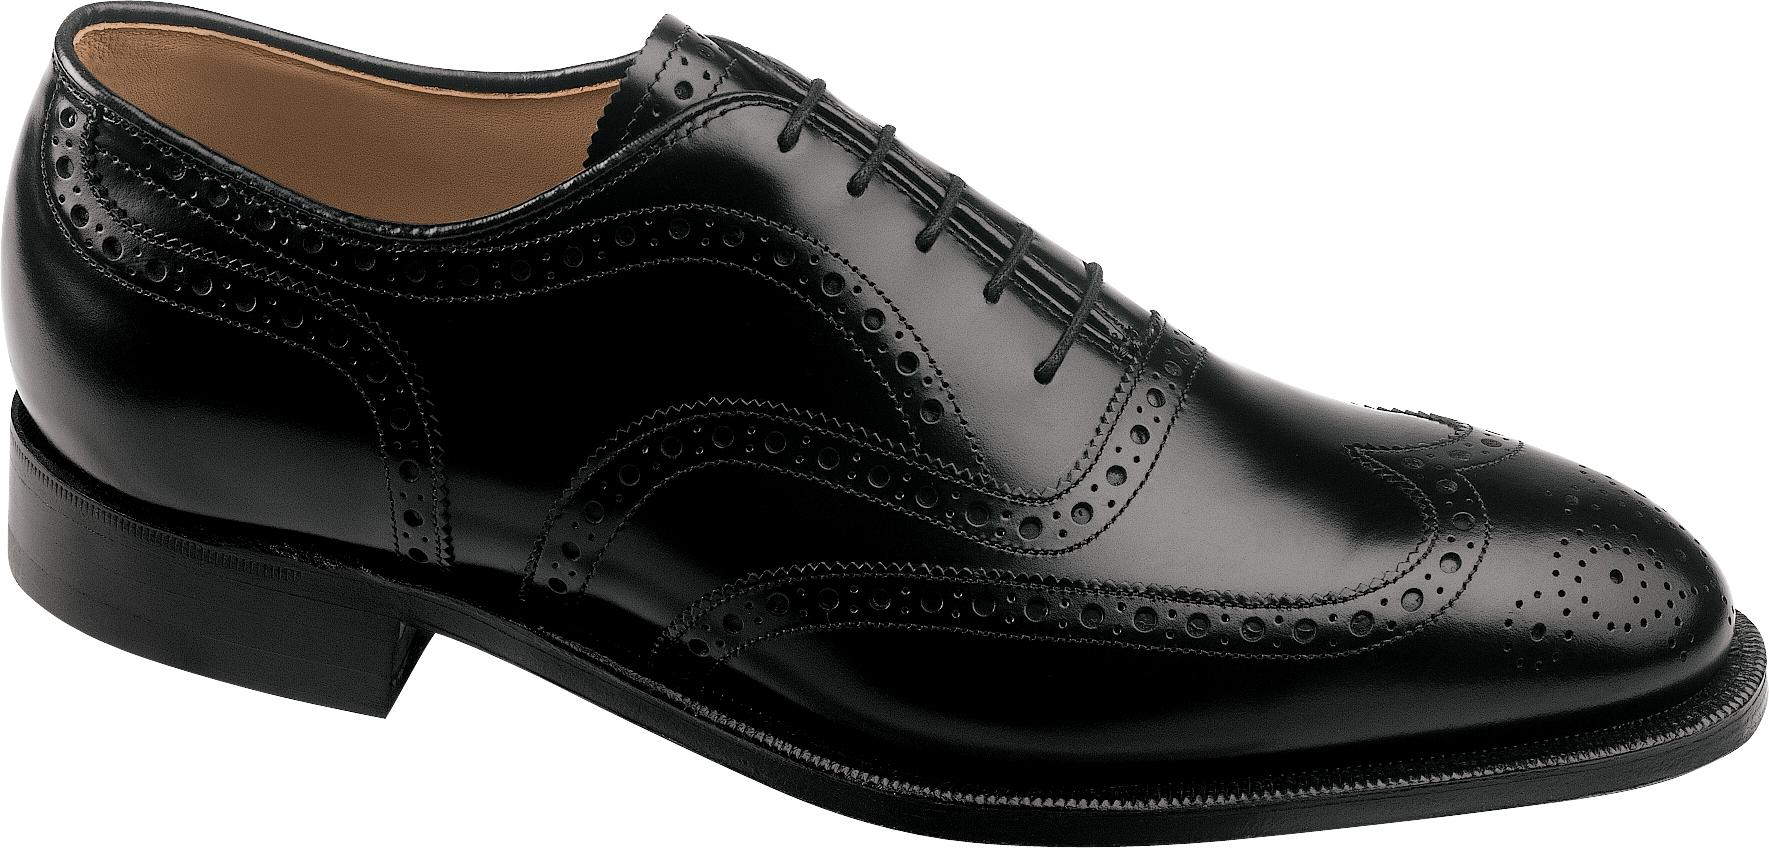 Johnston Murphy Mens Waverly Wingtip 22 3501 Black The Shoe Mart